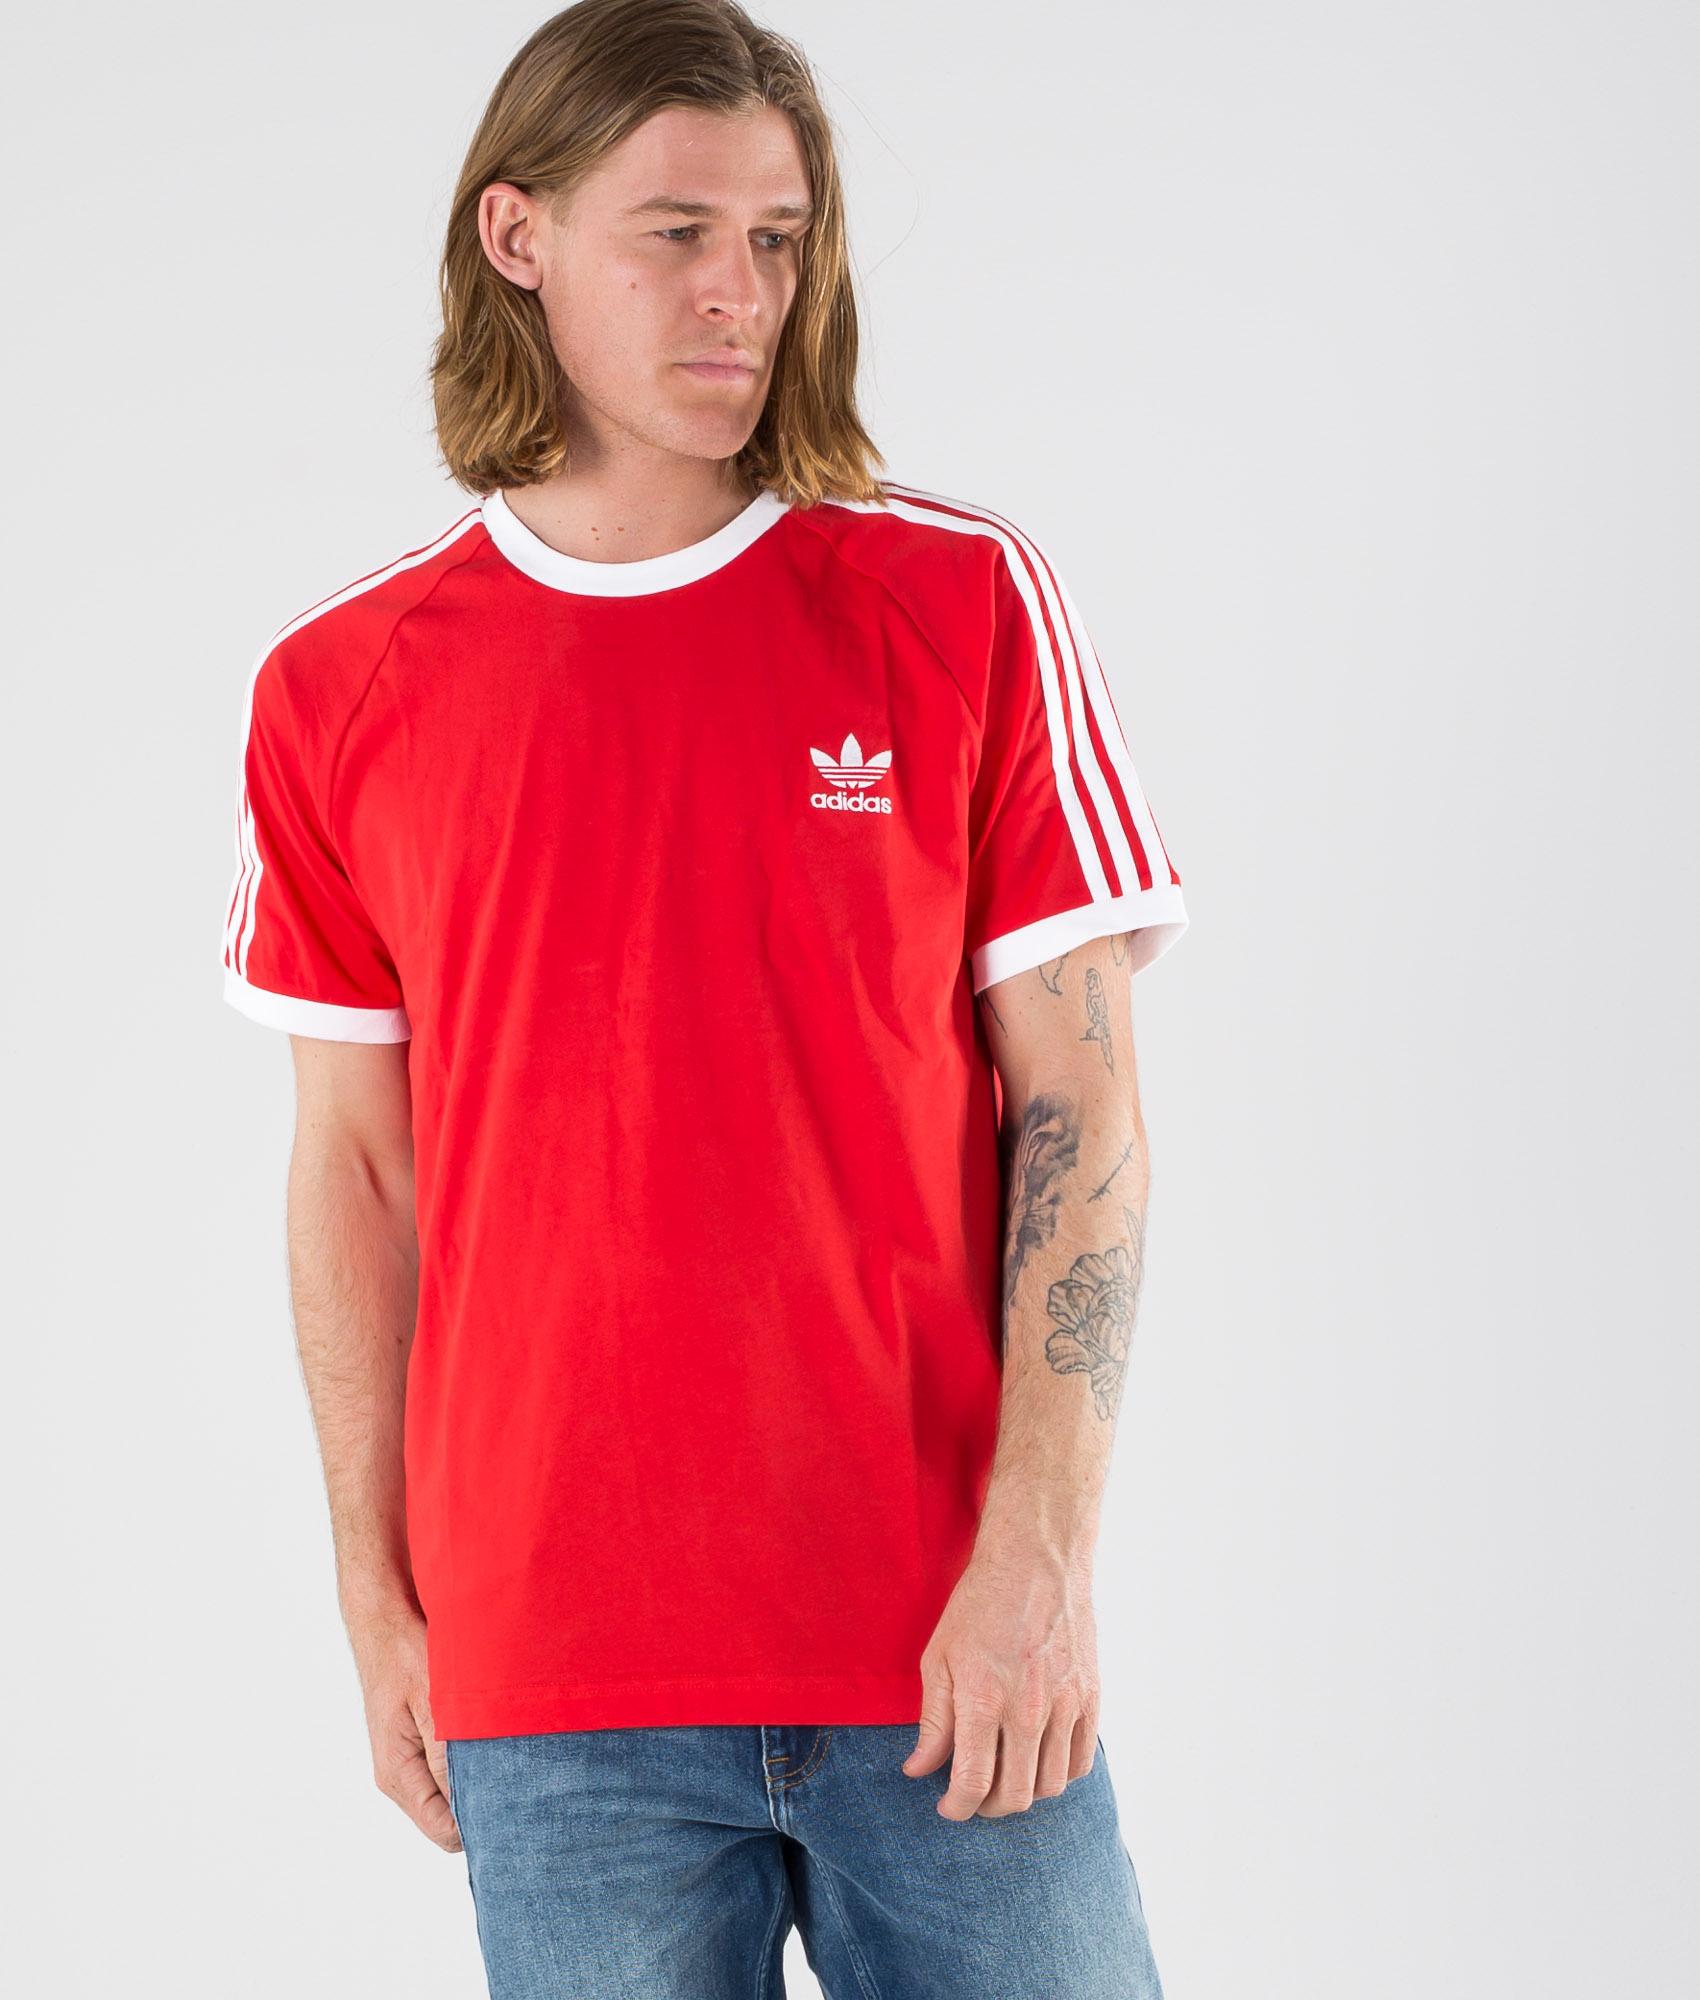 adidas 3-stripes tee t-shirt rot